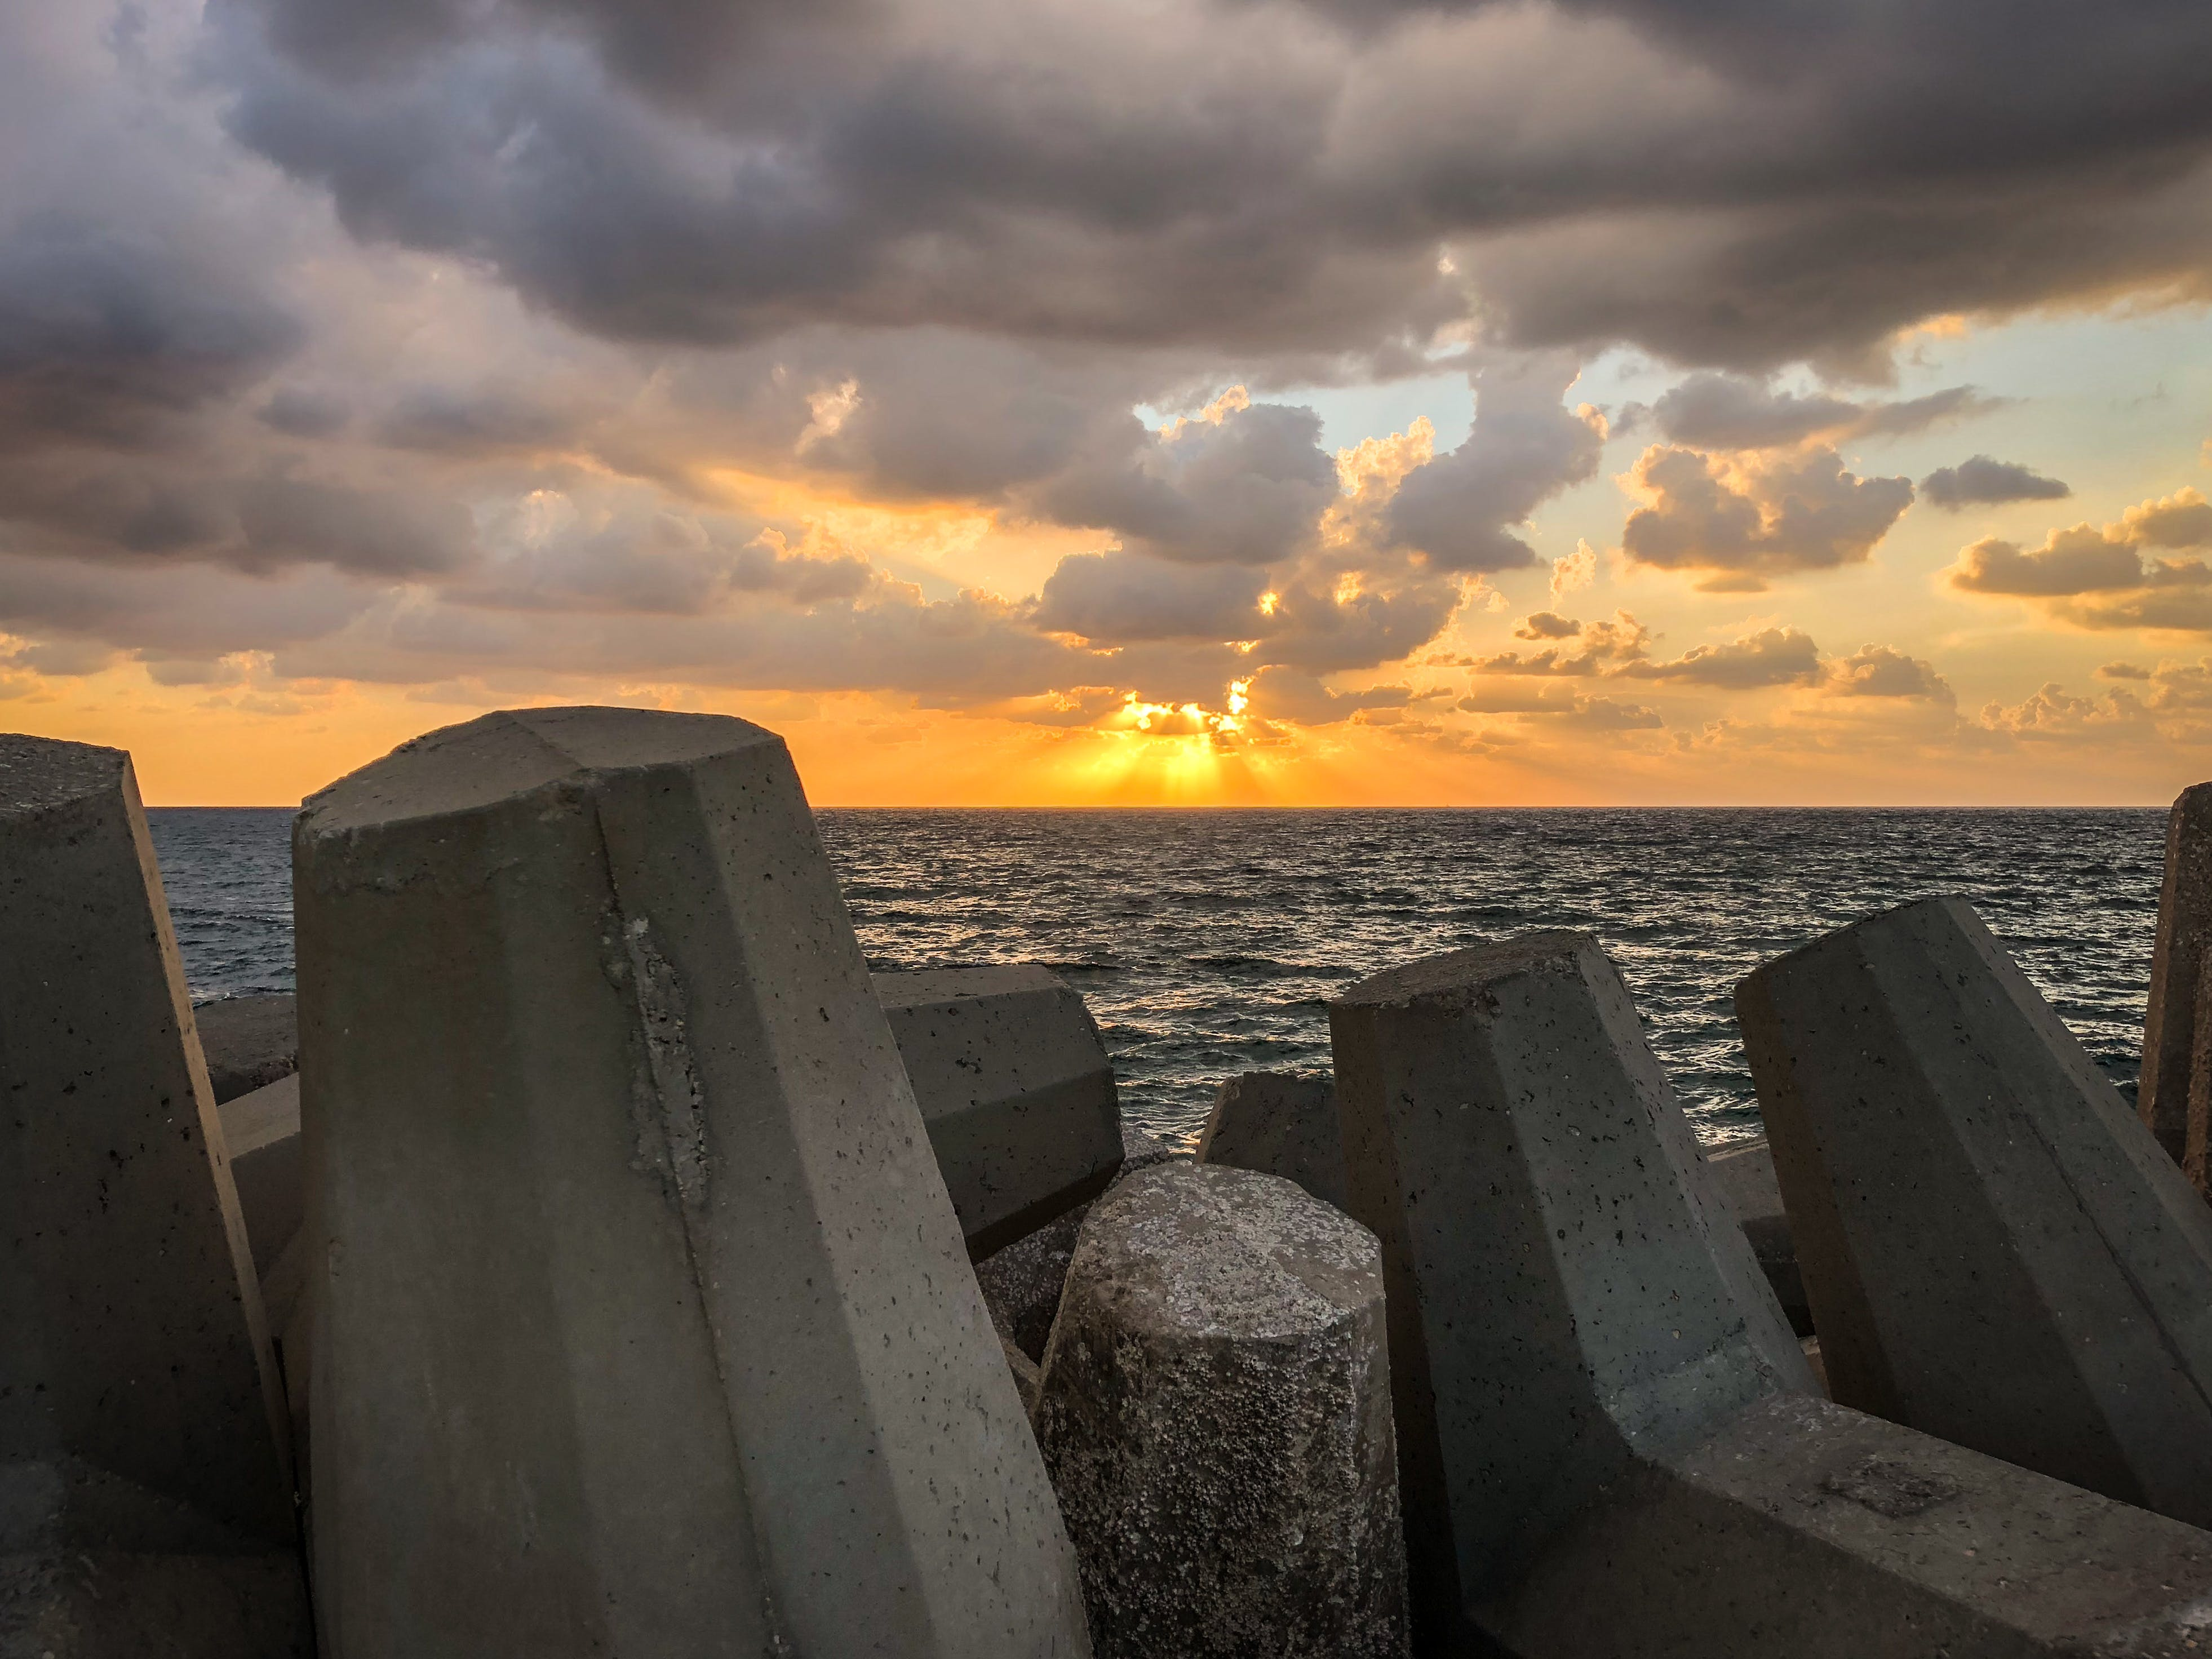 Free stock photo of Israel, sea, sky, srone